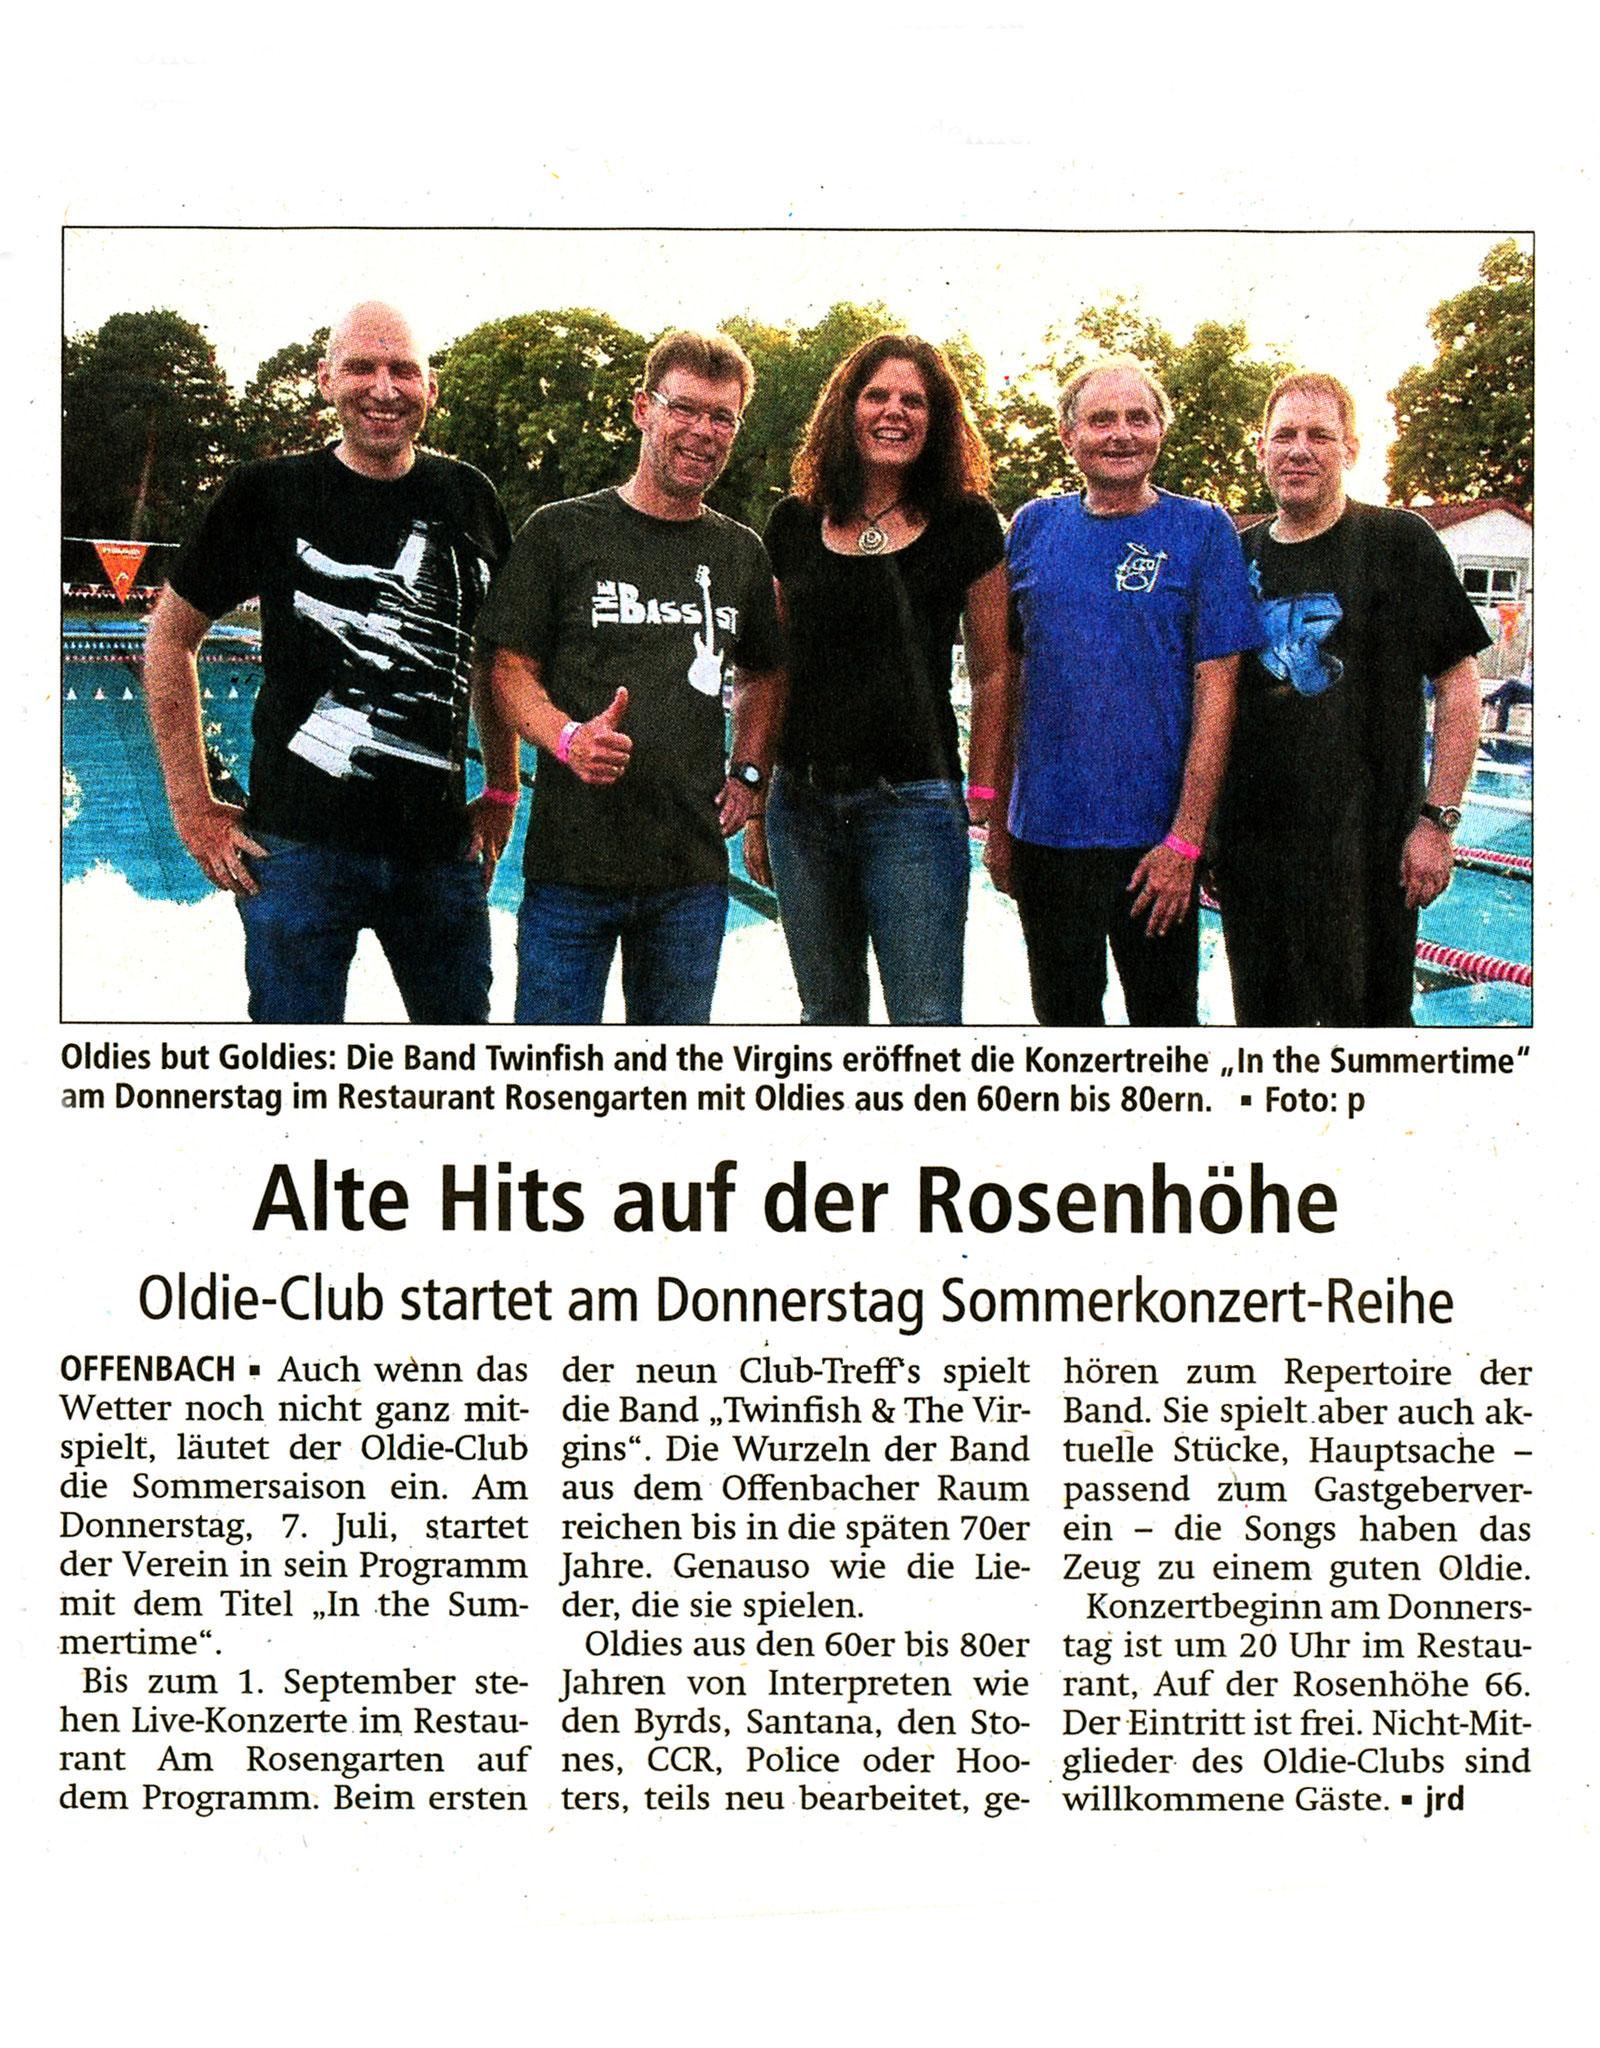 Offenbach Post, 5. Juli 2016